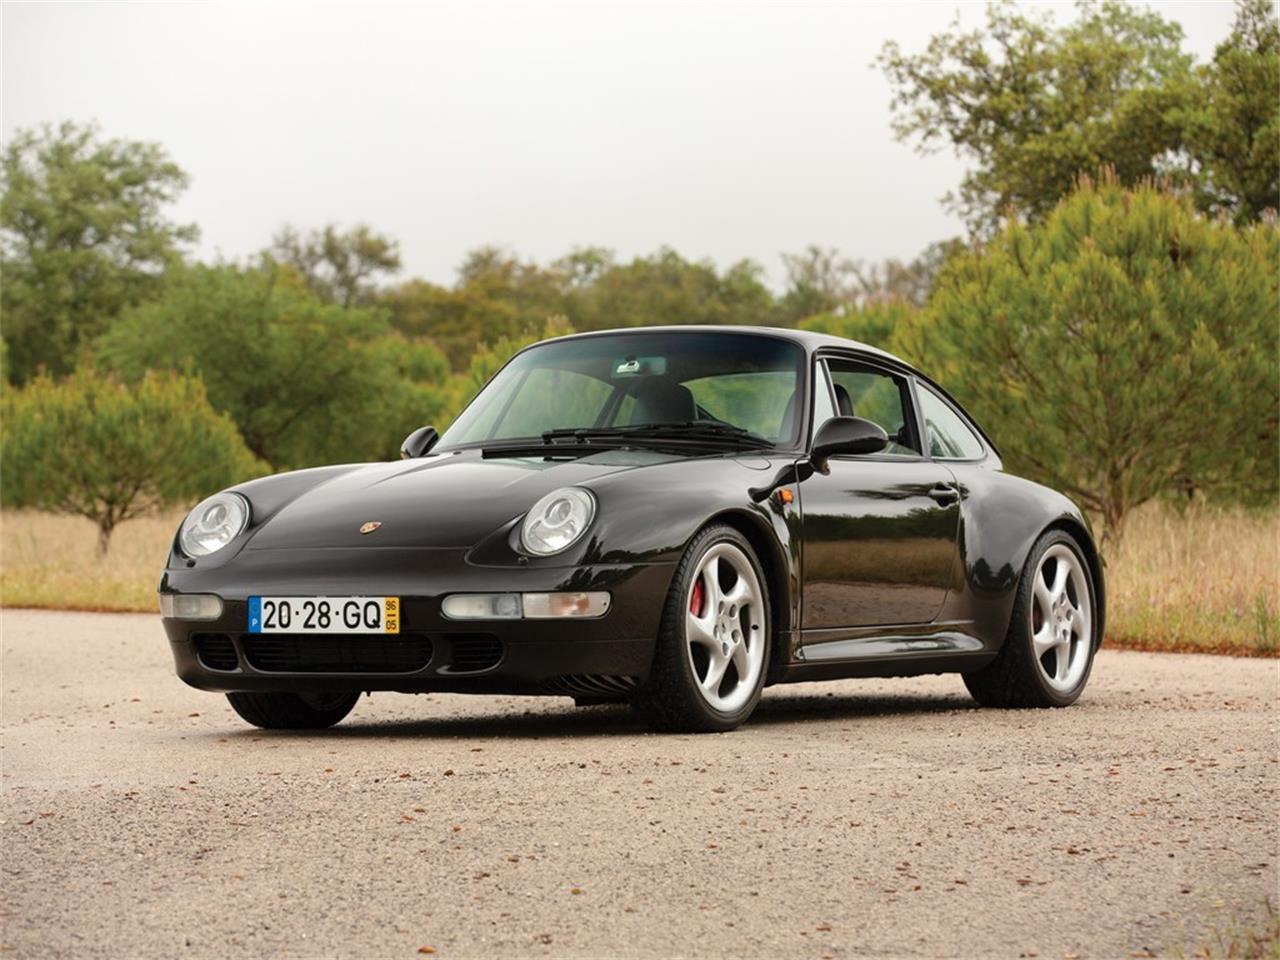 1996 Porsche 911 Carrera 4S (CC-1249700) for sale in Monteira,